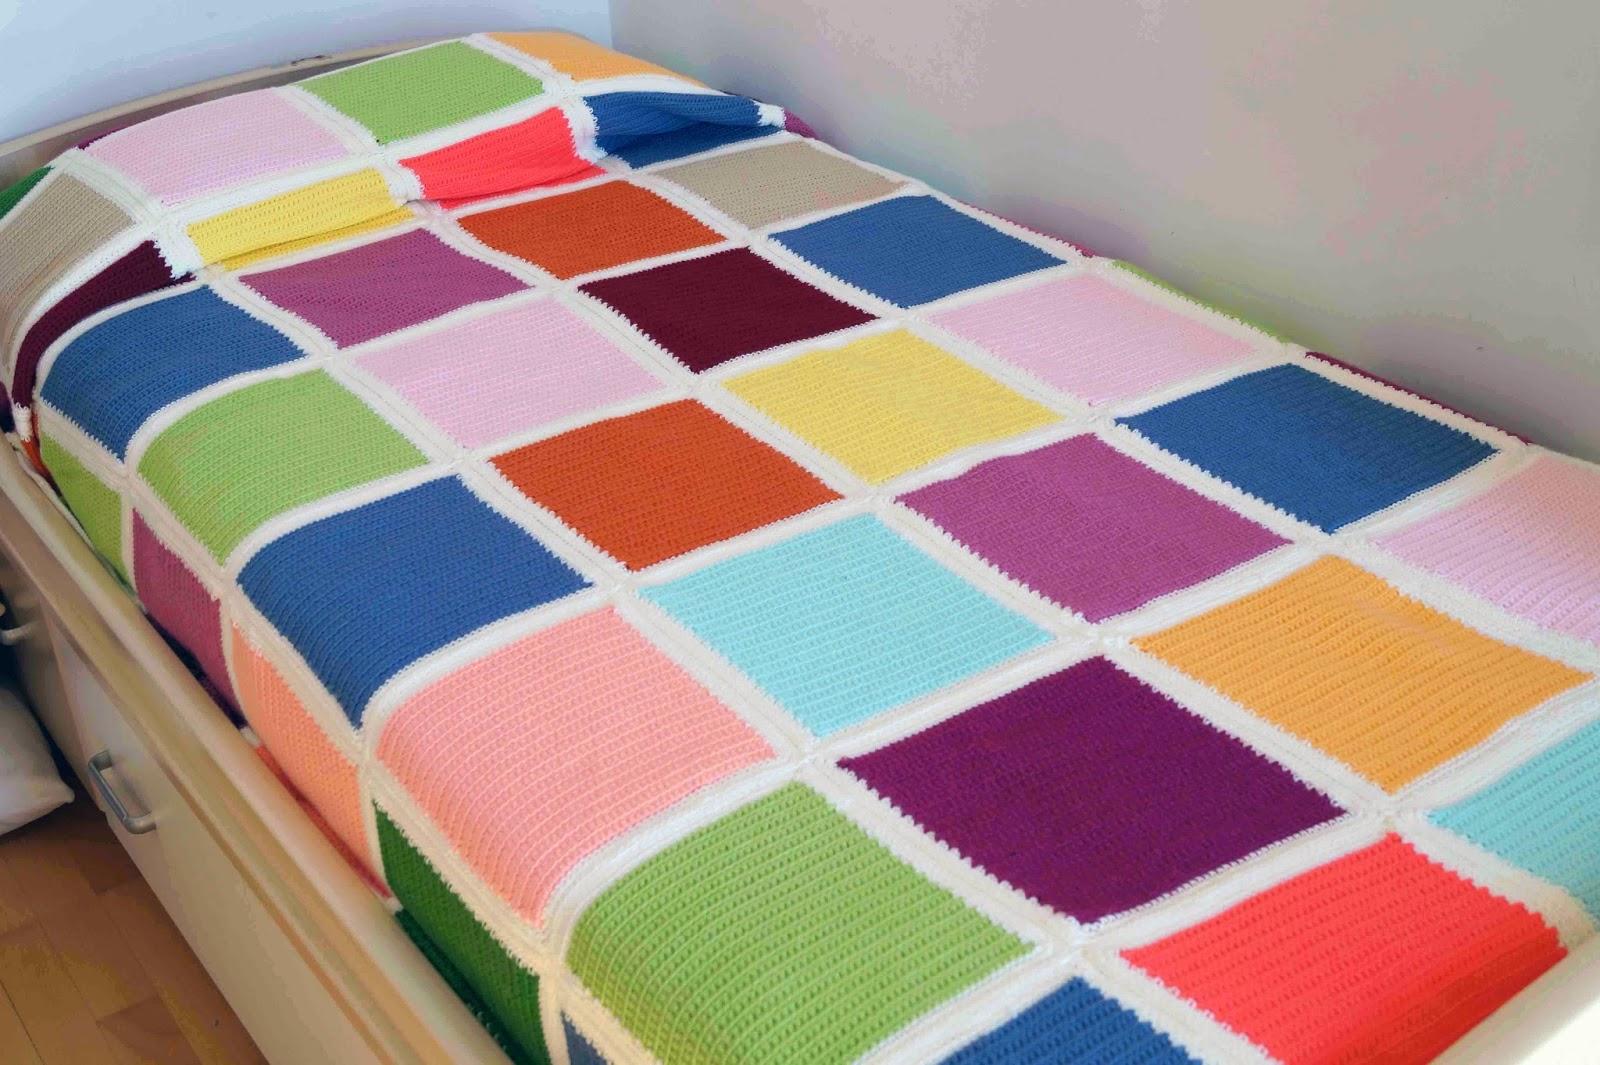 Deshilachado Colchas De Ganchillo Crocheted Blankets